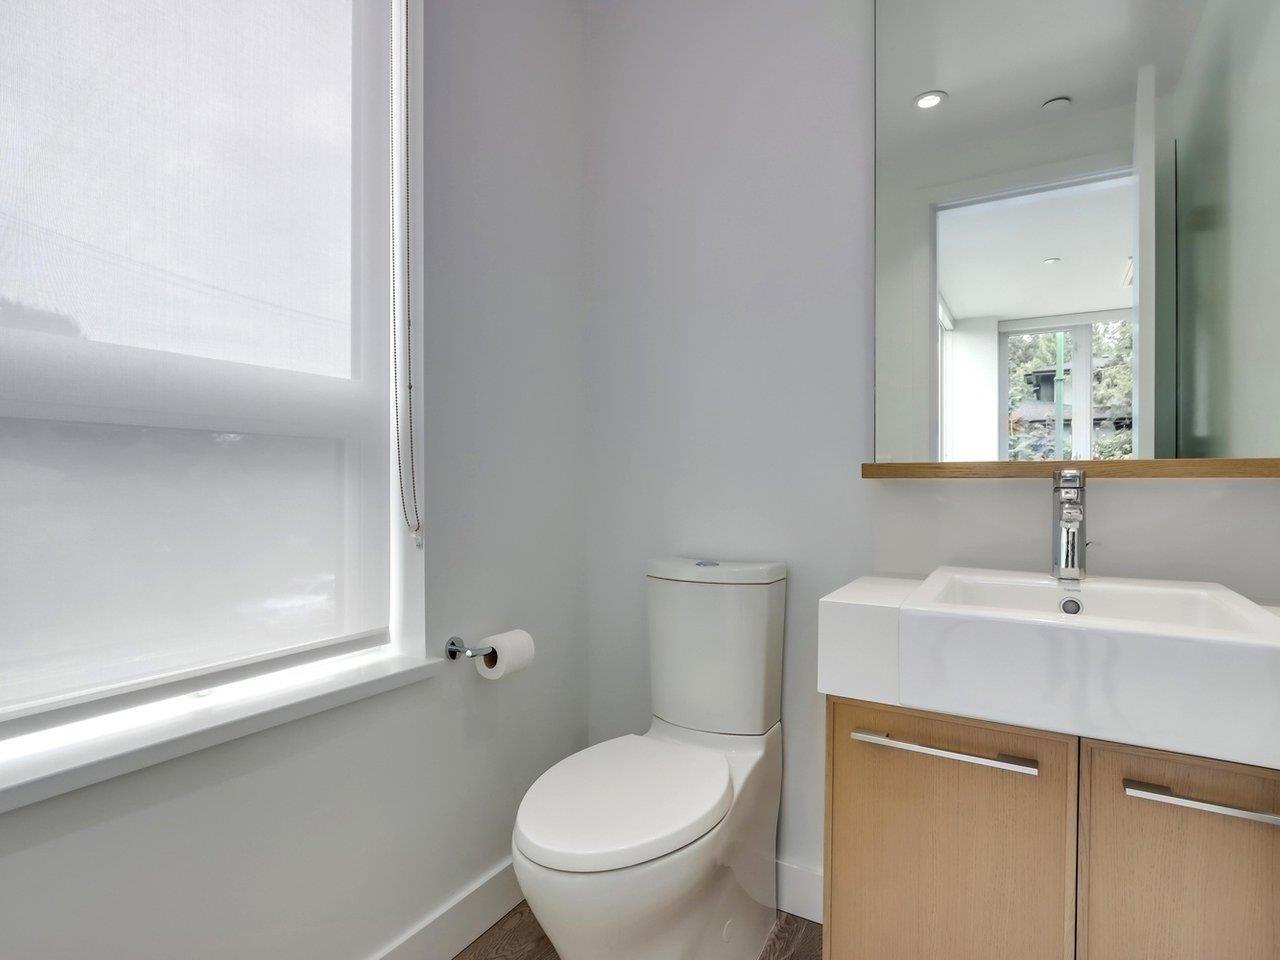 202 1055 RIDGEWOOD DRIVE - Edgemont Townhouse for sale, 3 Bedrooms (R2611487) - #13